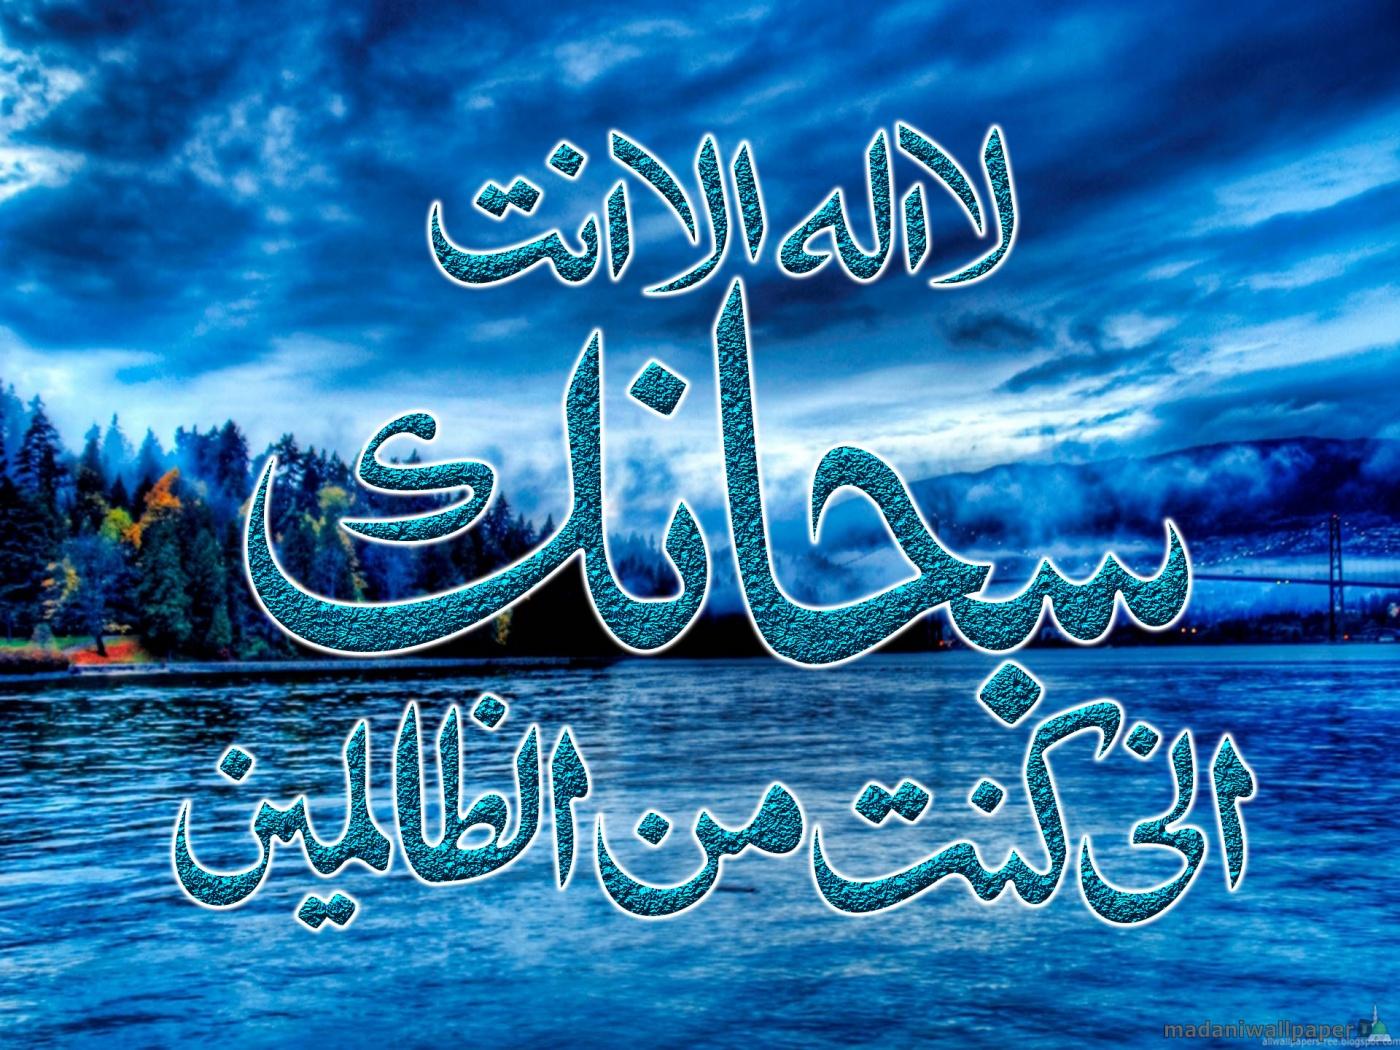 بالصور صوردينيه اسلاميه , اجمل صور دينيه اسلامية 3630 4